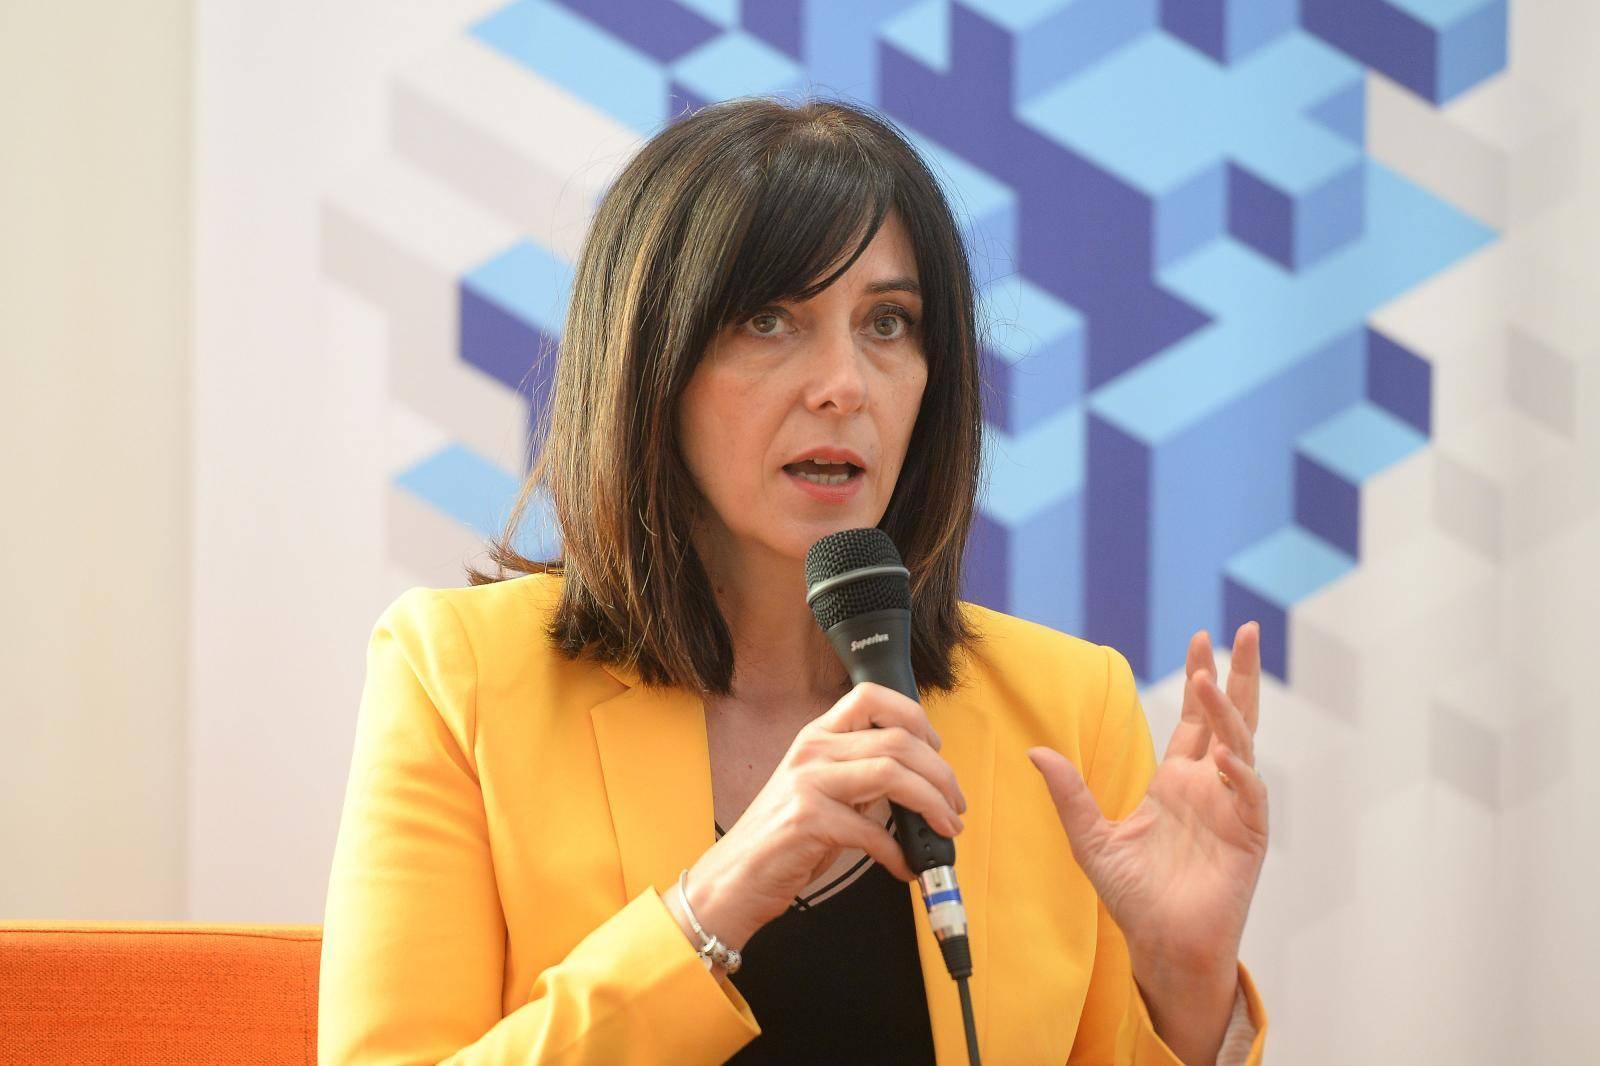 Sindikat hrvatskih učitelja šokiran optužbama ministrice